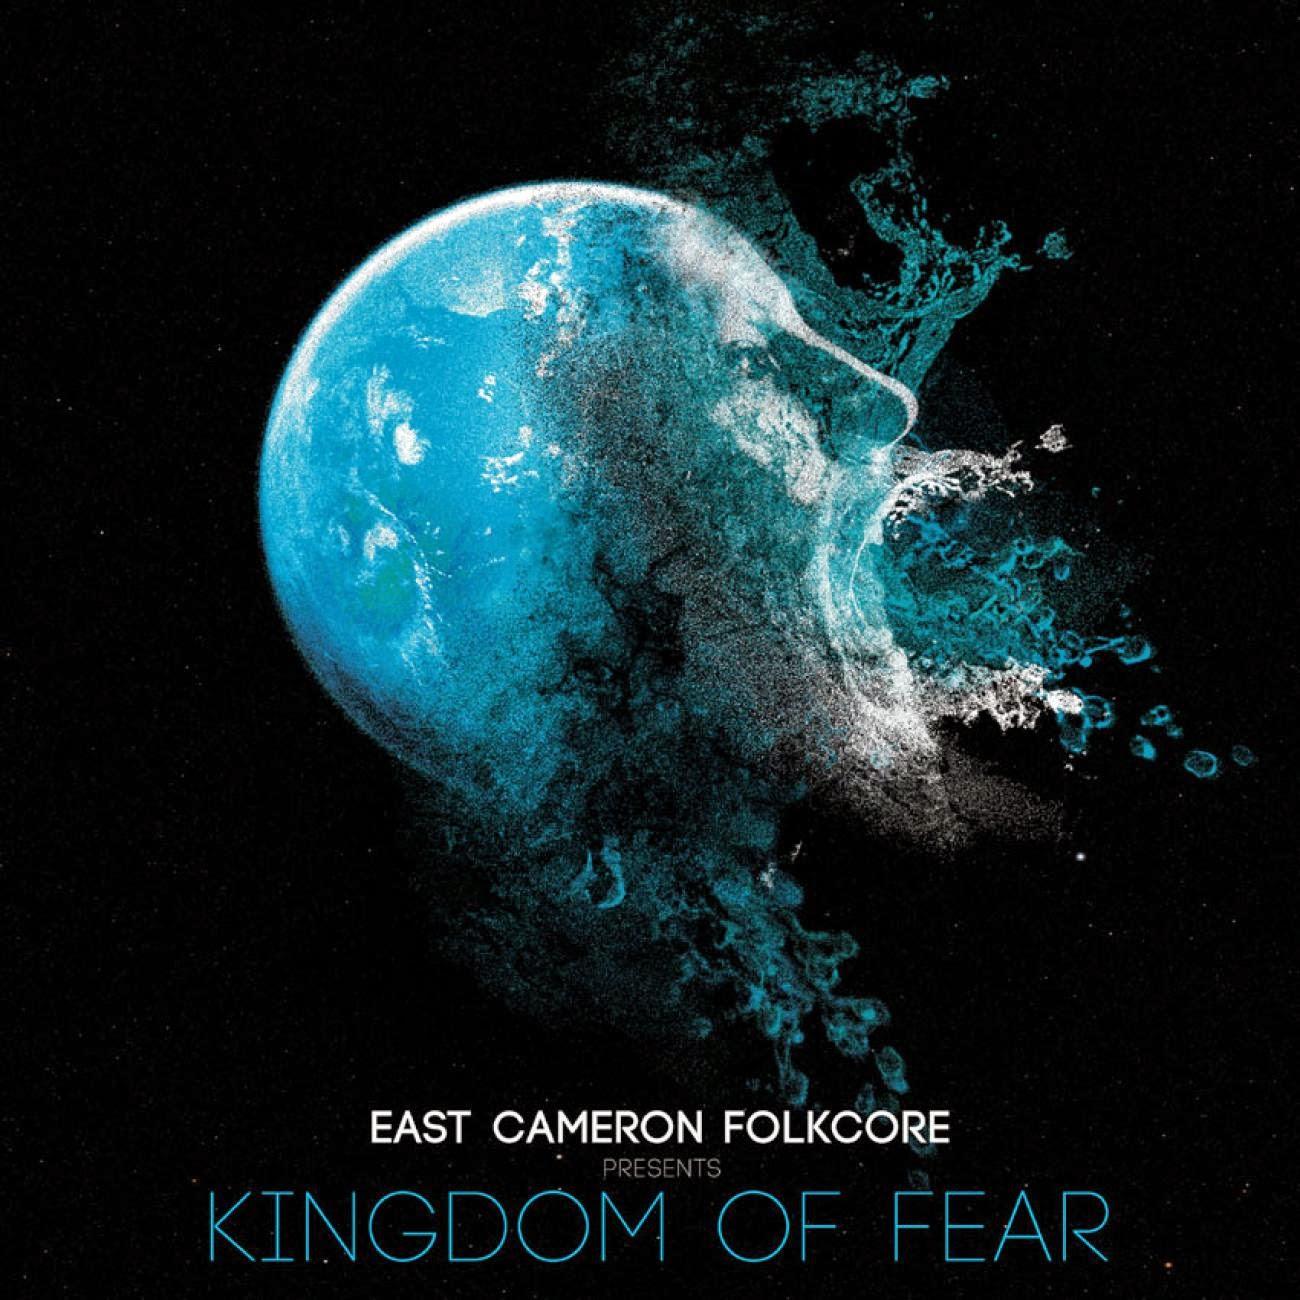 East Cameron Folkcore - Kingdom Of Fear